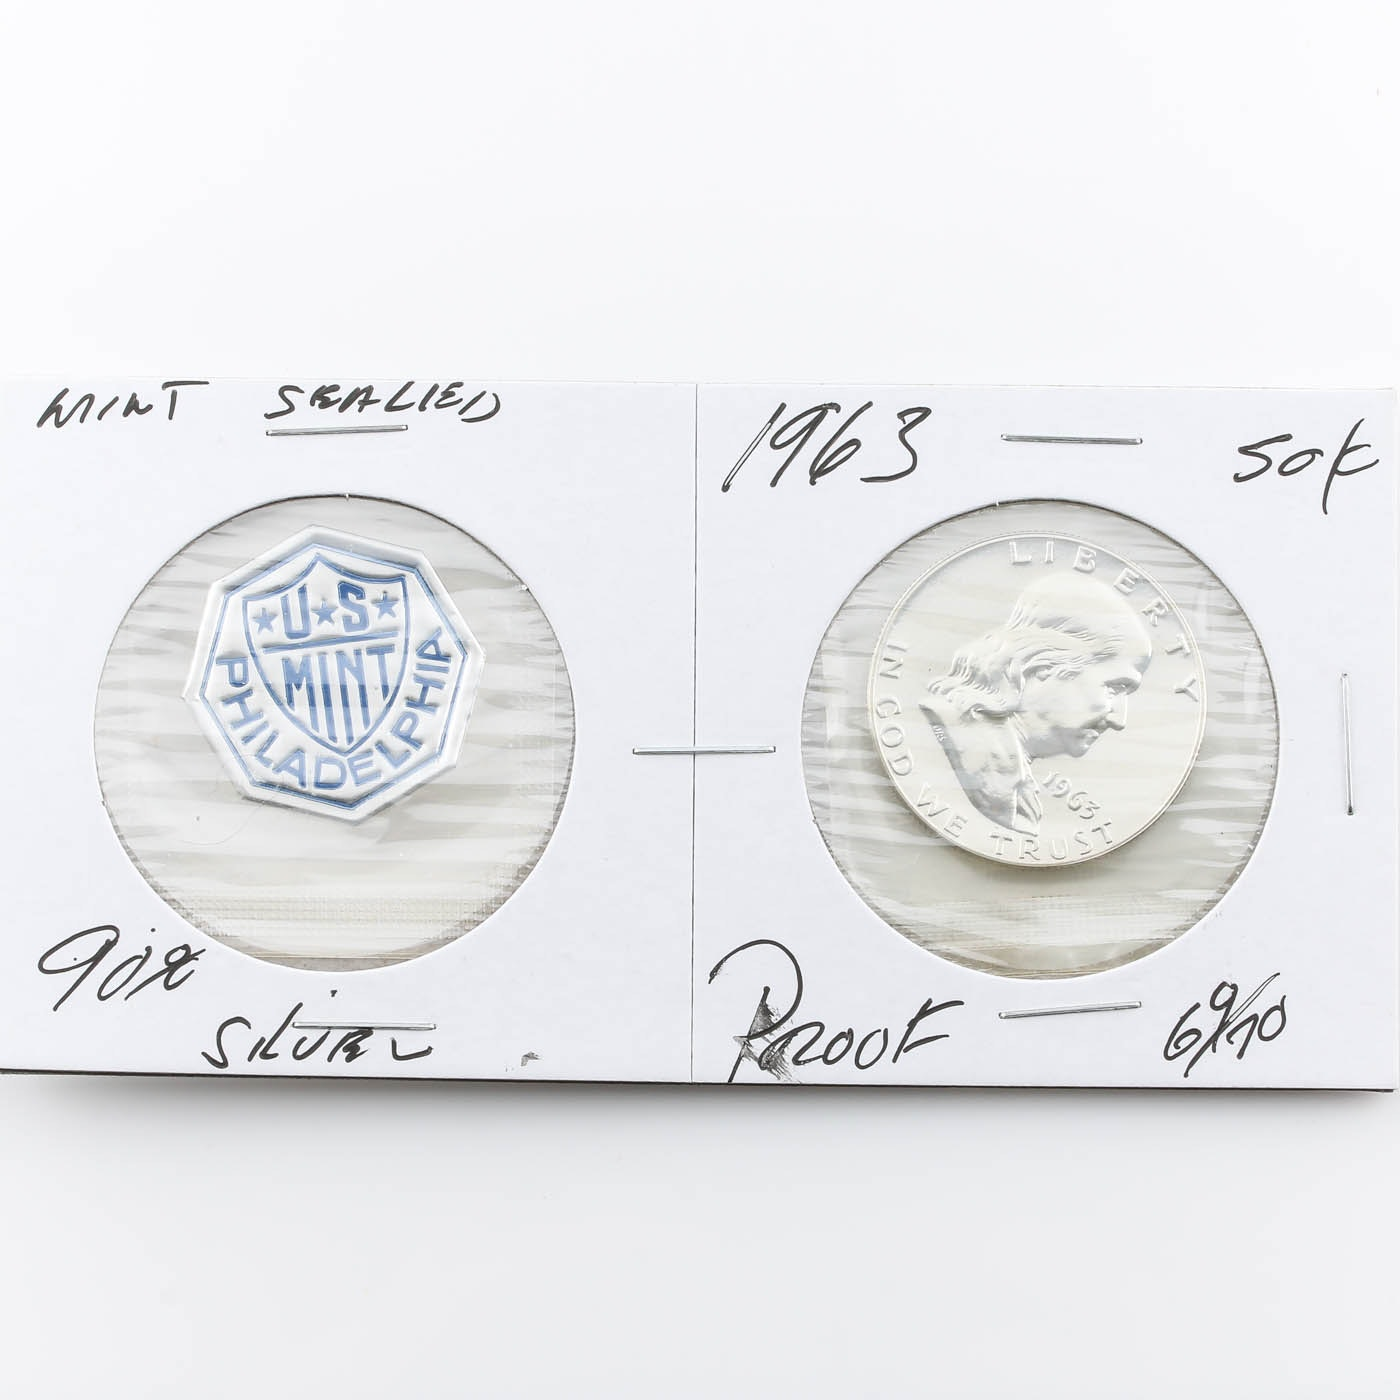 1963 Franklin Silver Half Dollar Proof Coin